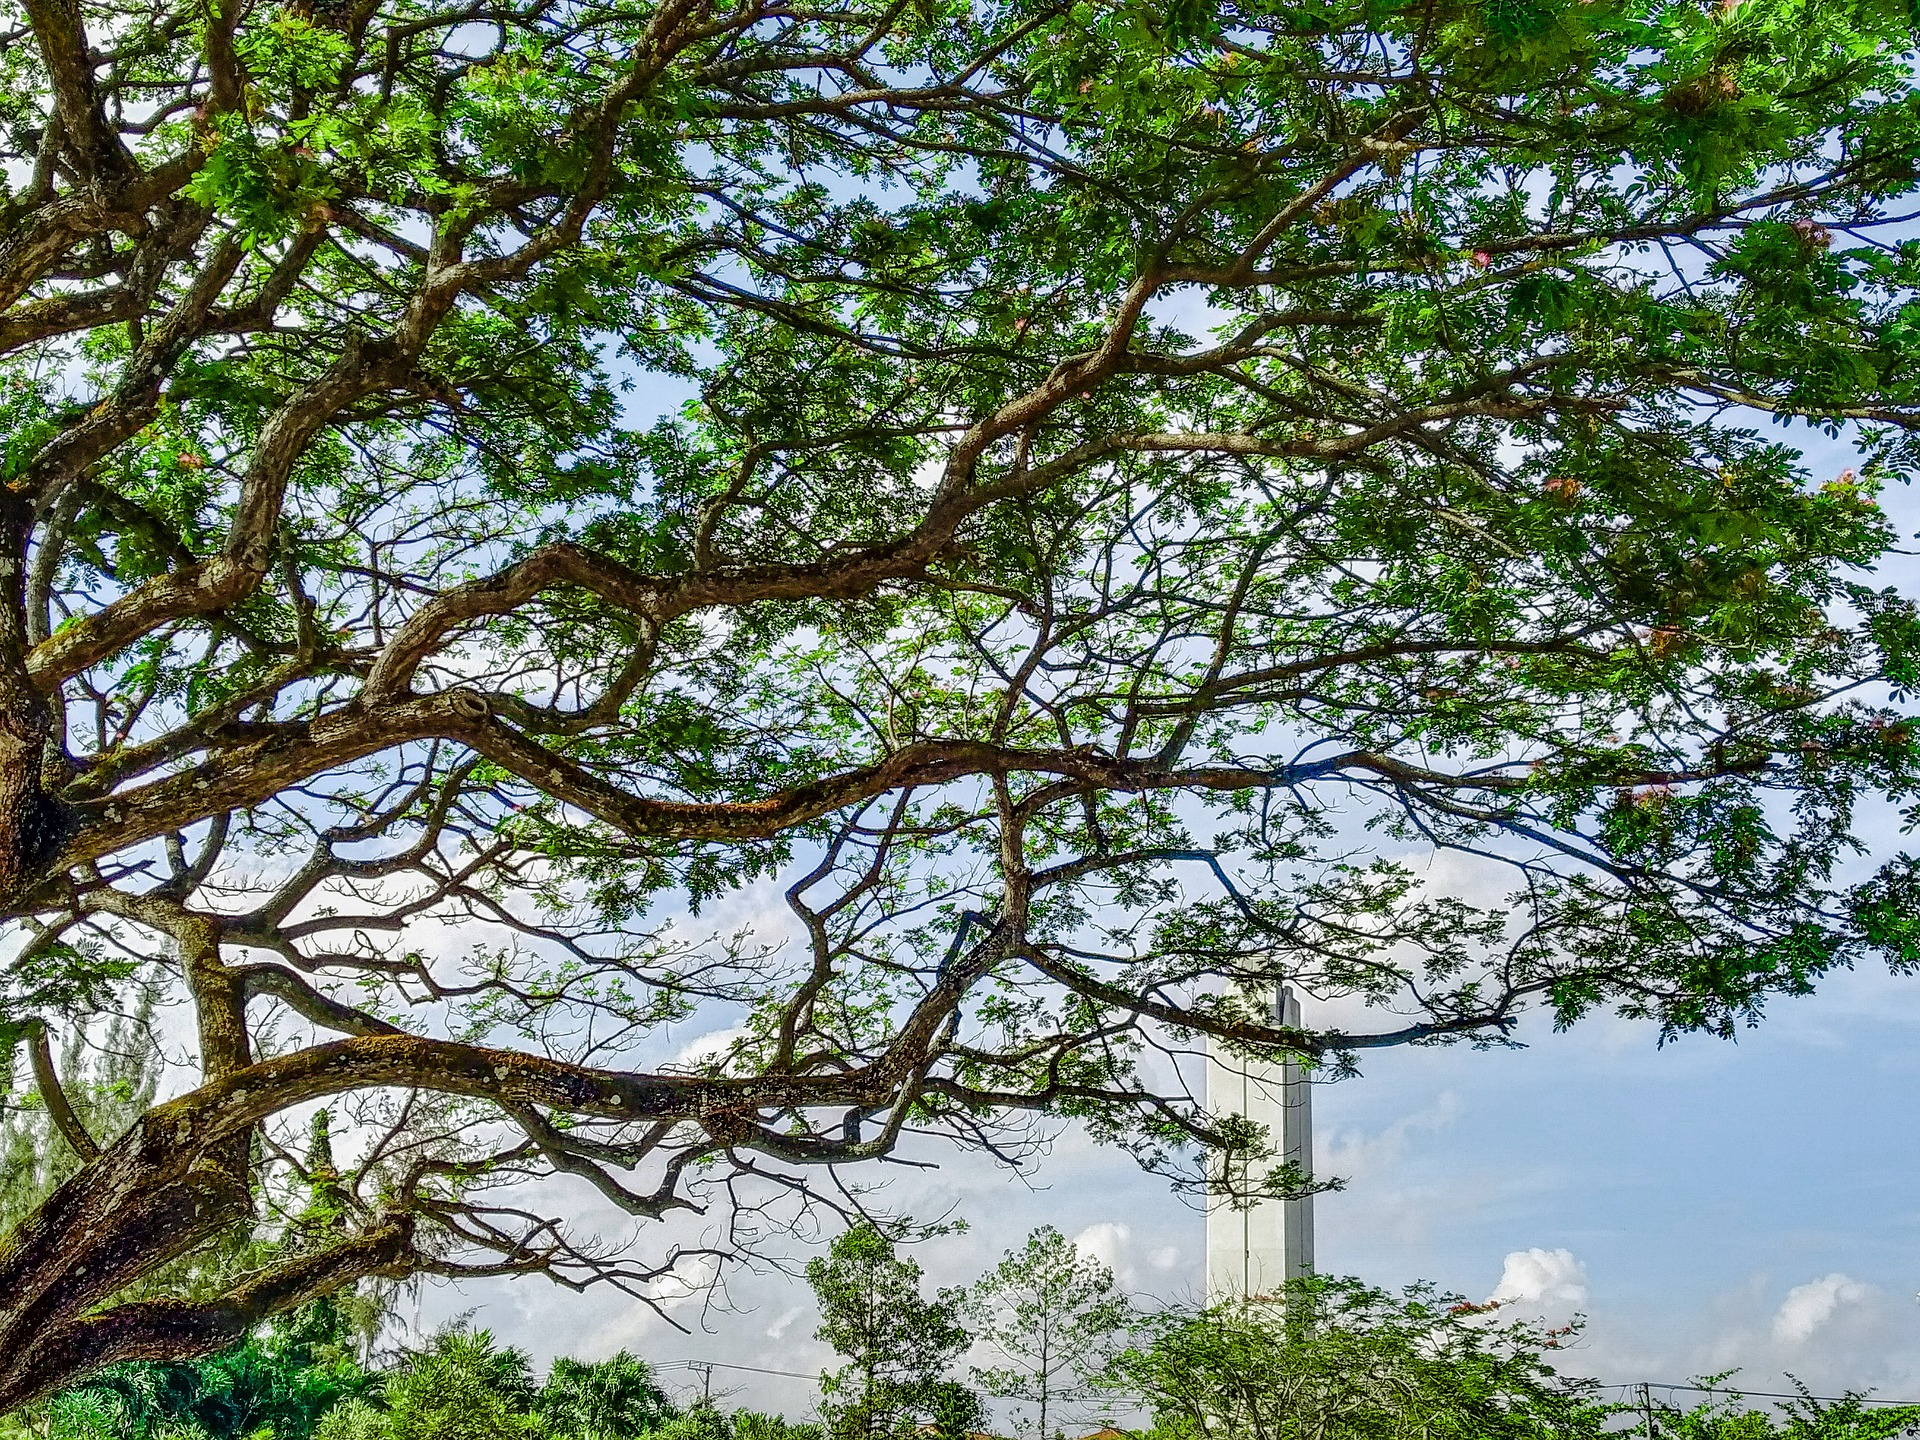 tree-5040452_1920.jpg